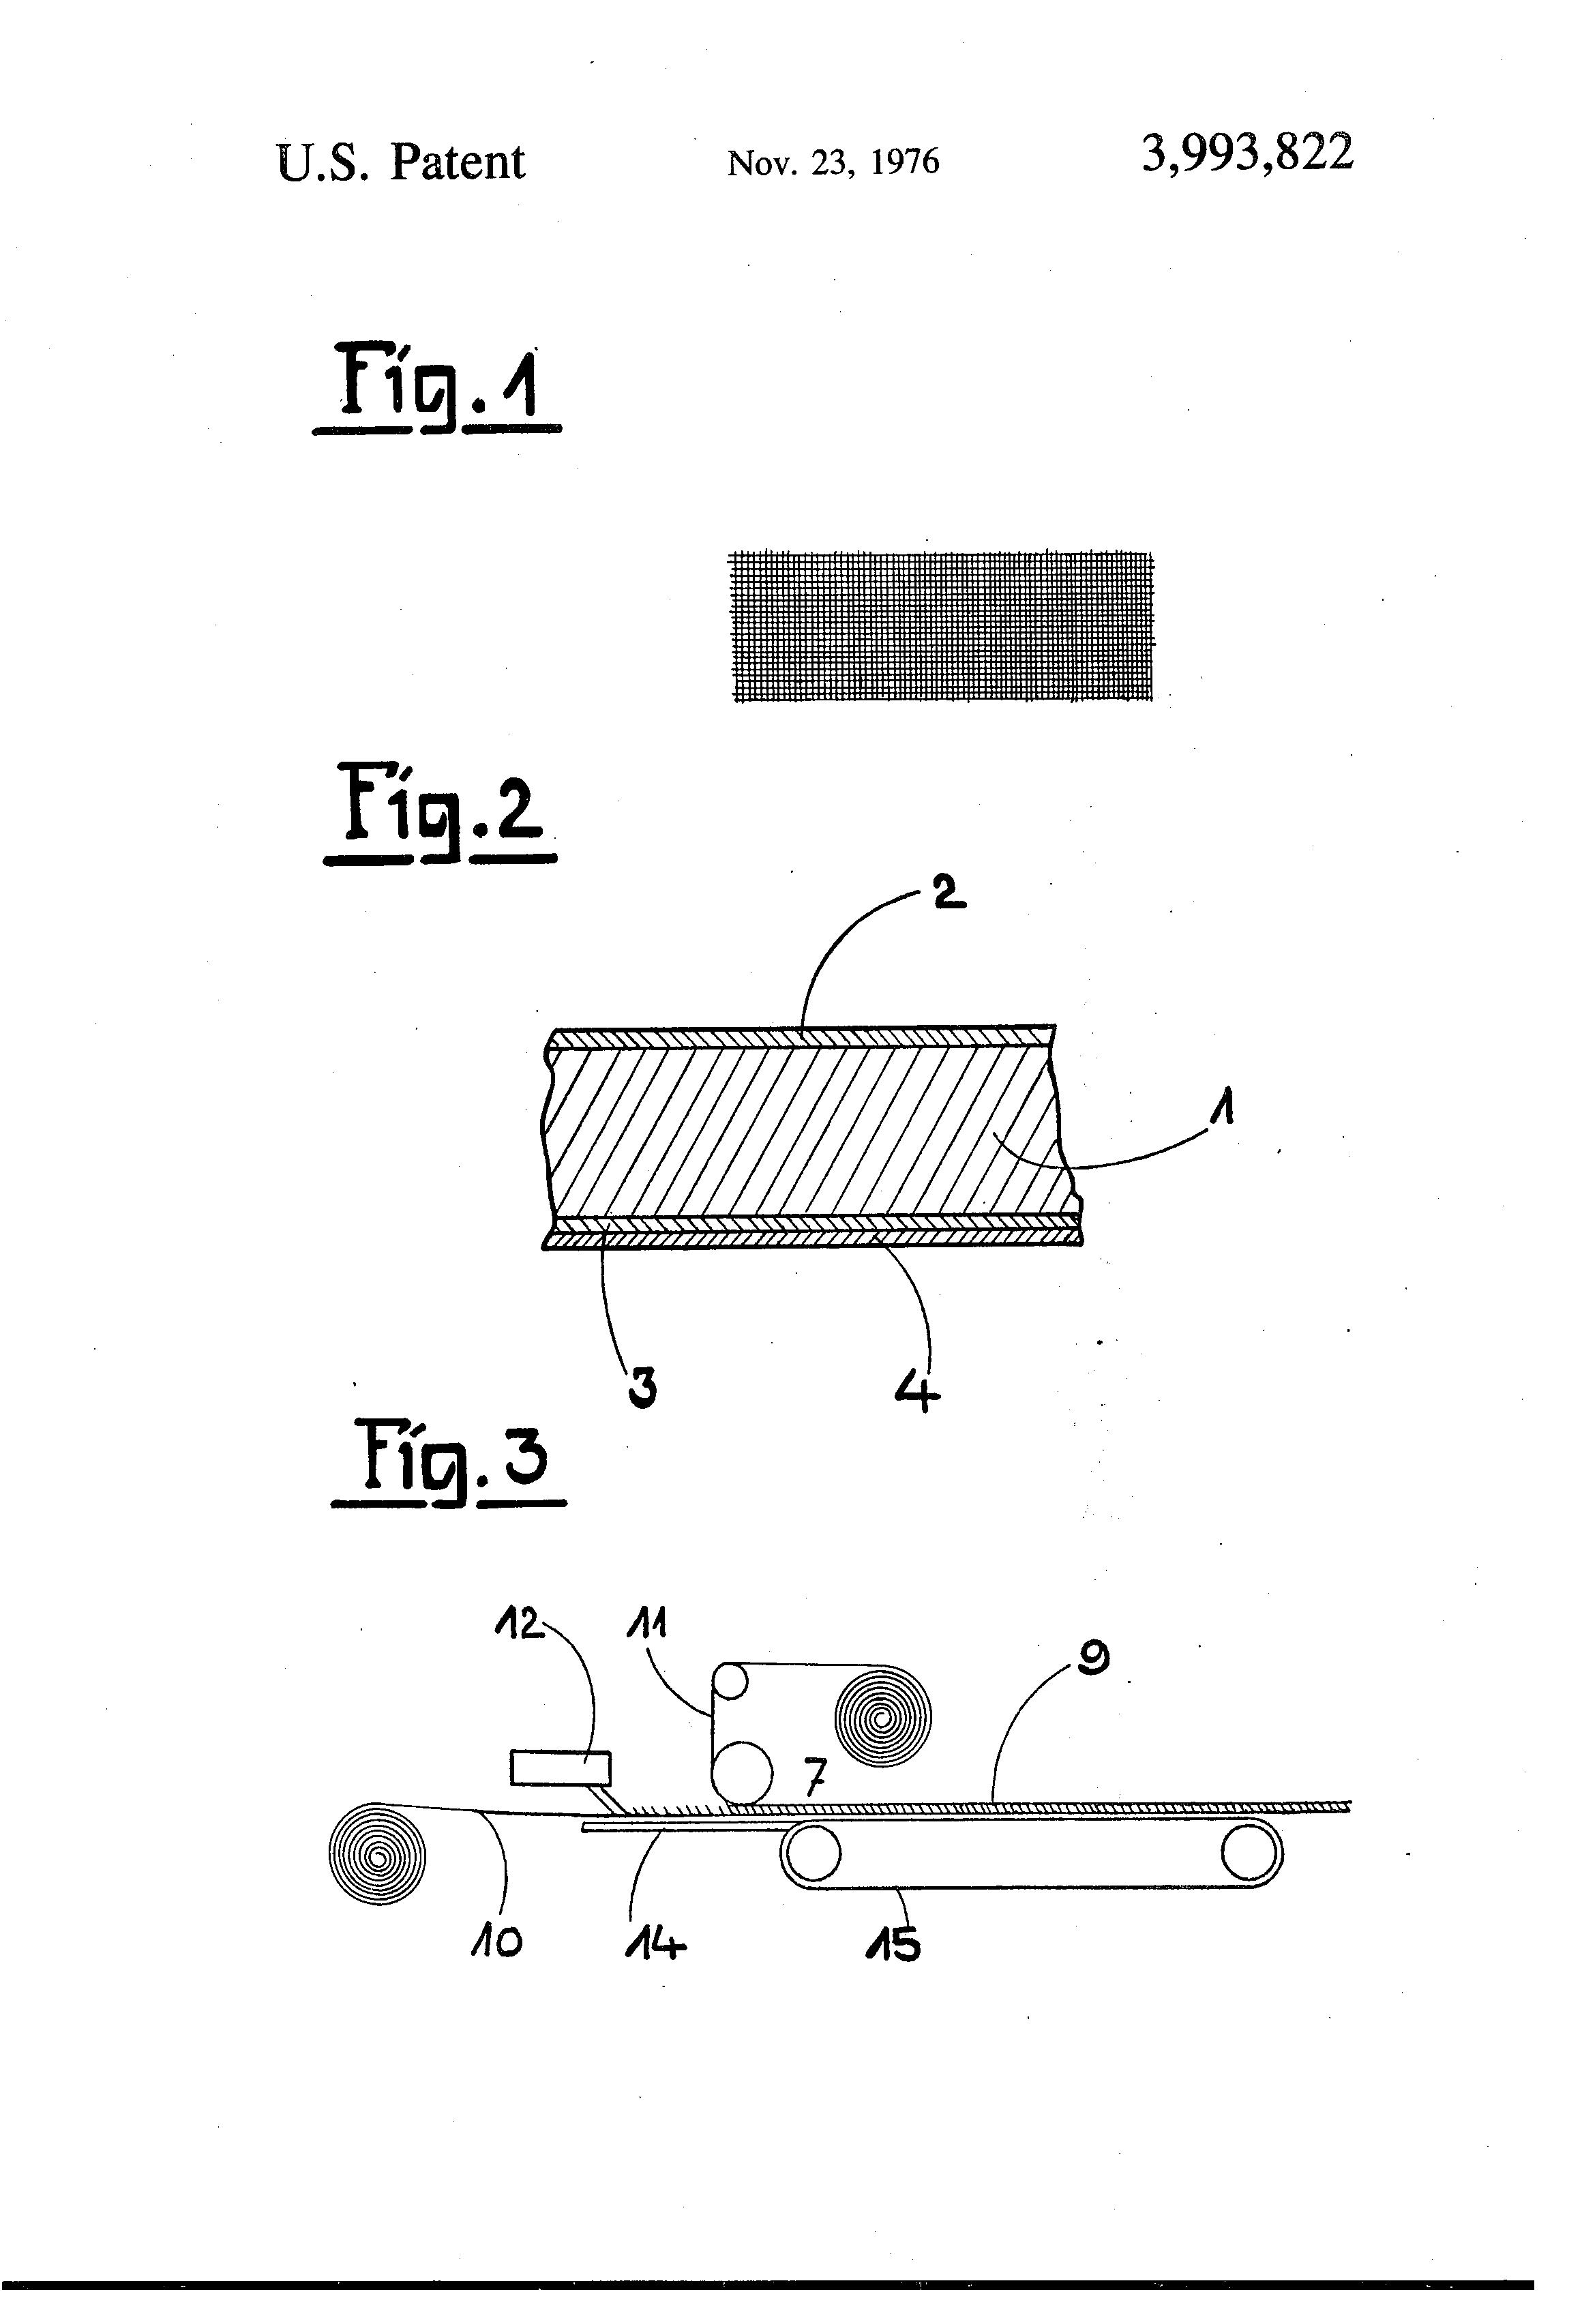 Multi Drywall Layers : Patent us multi layer plasterboard google patenten